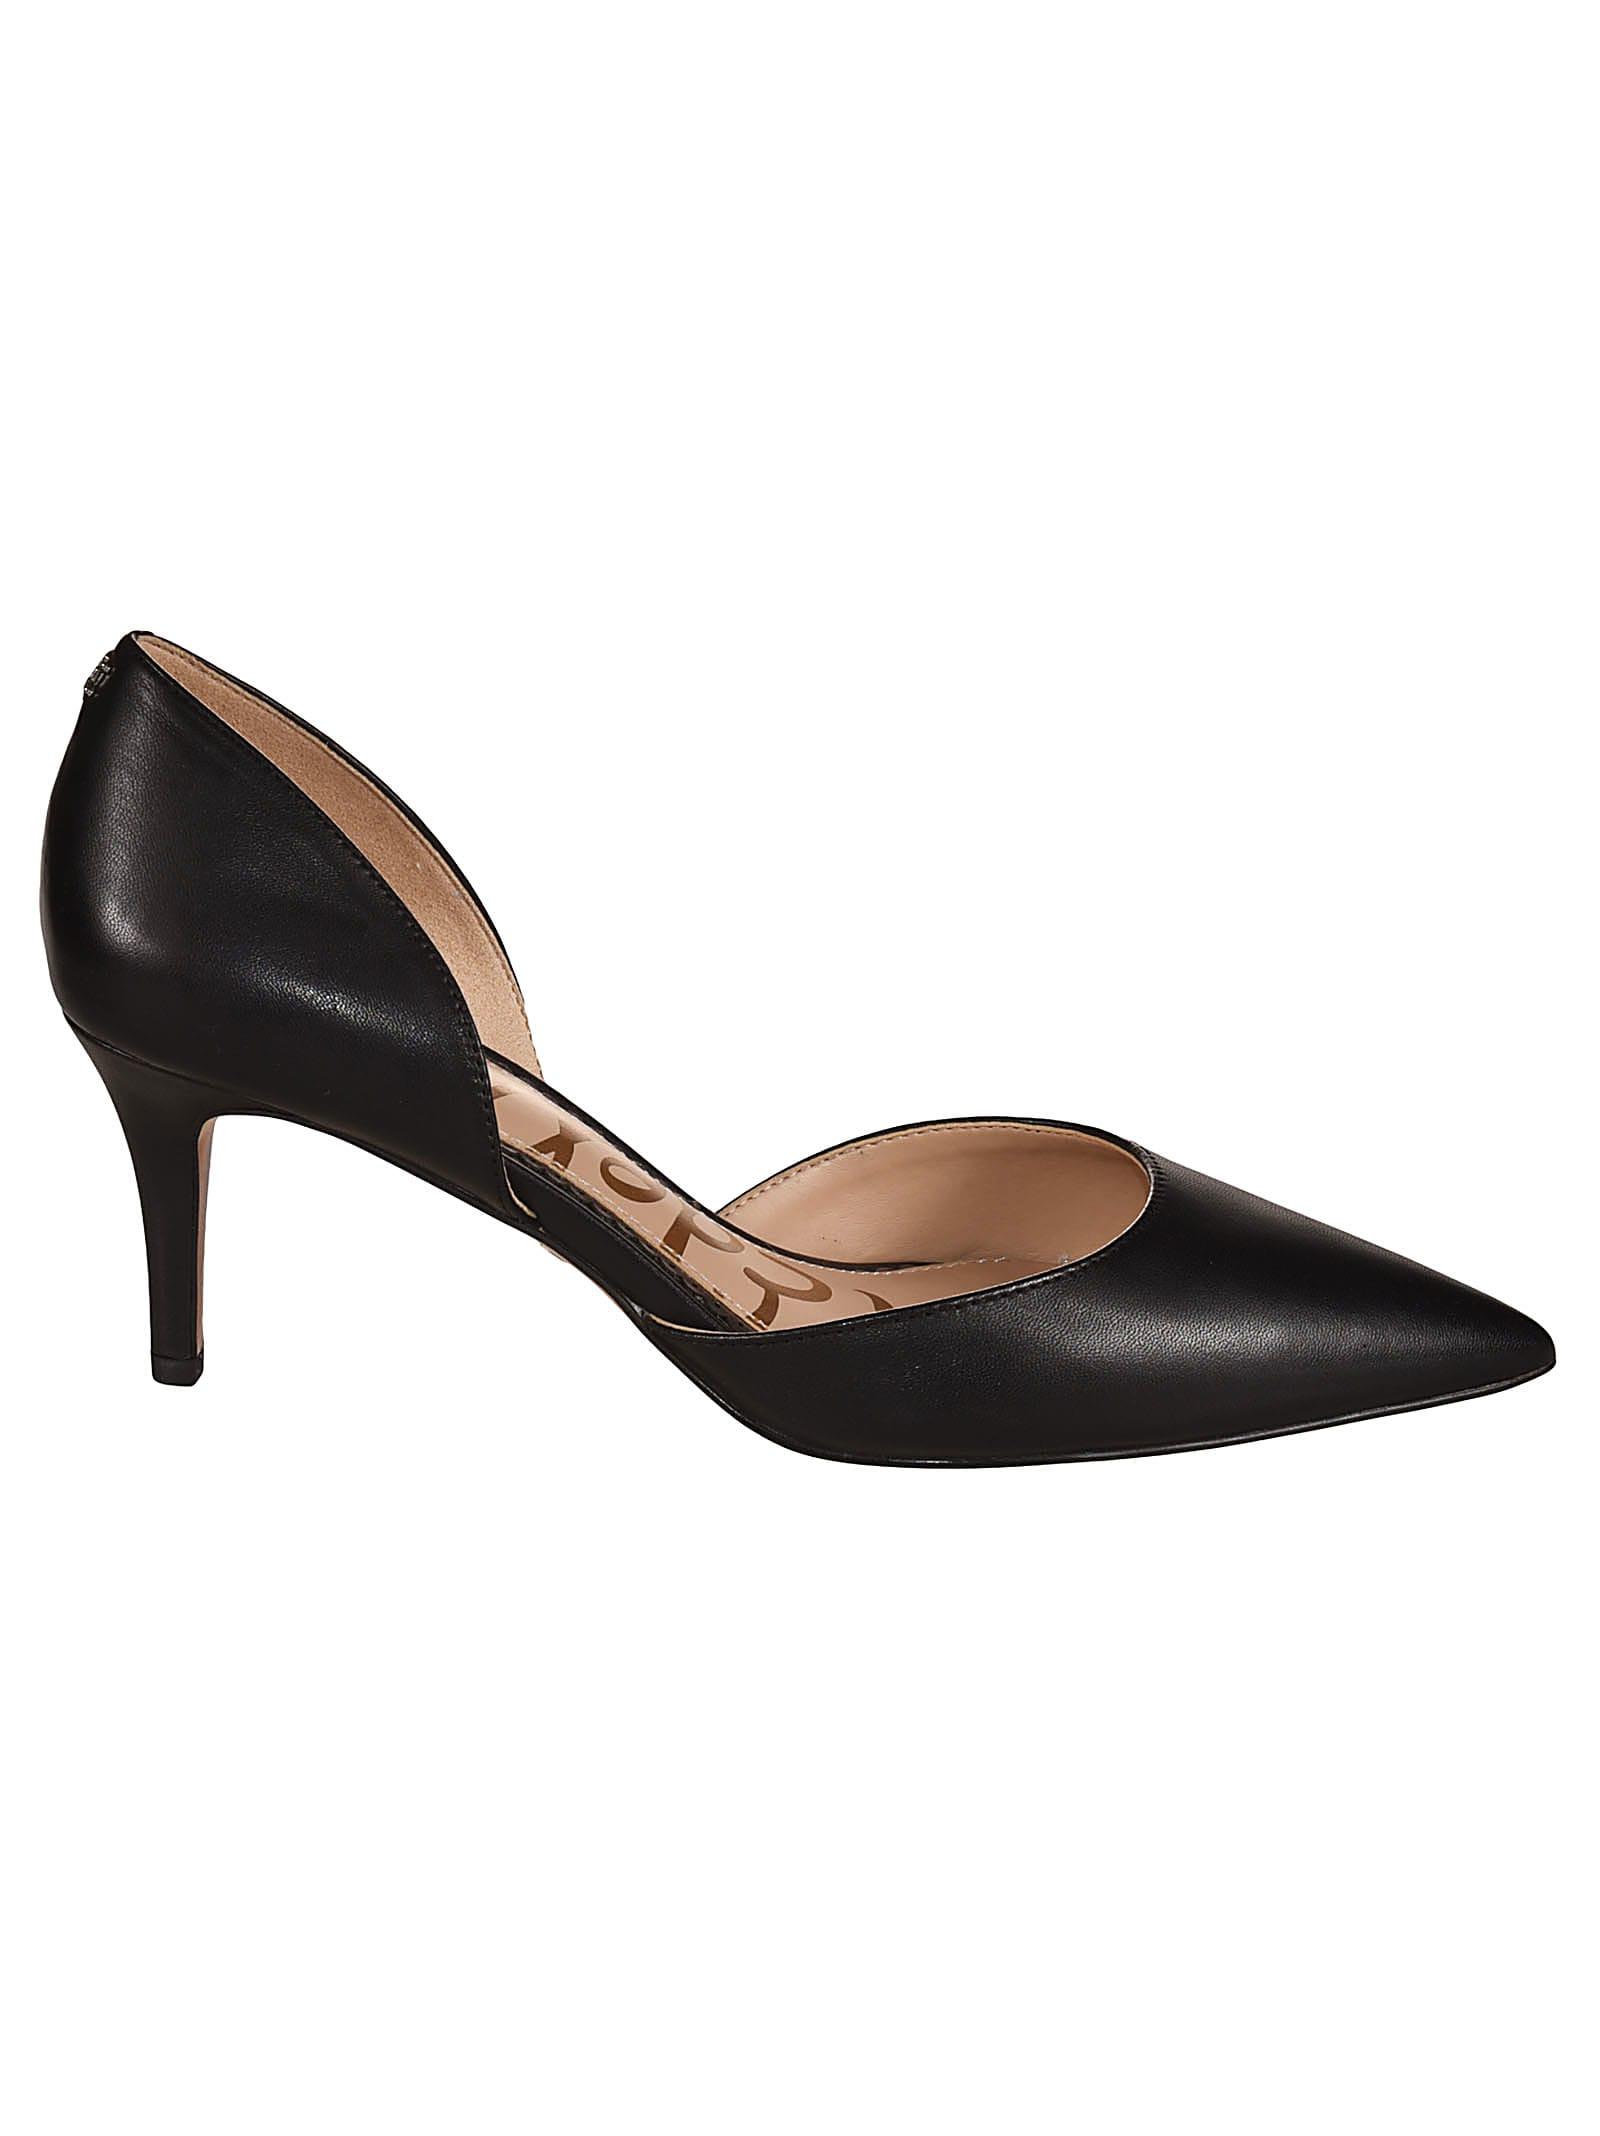 Buy Sam Edelman Jaina Pumps online, shop Sam Edelman shoes with free shipping